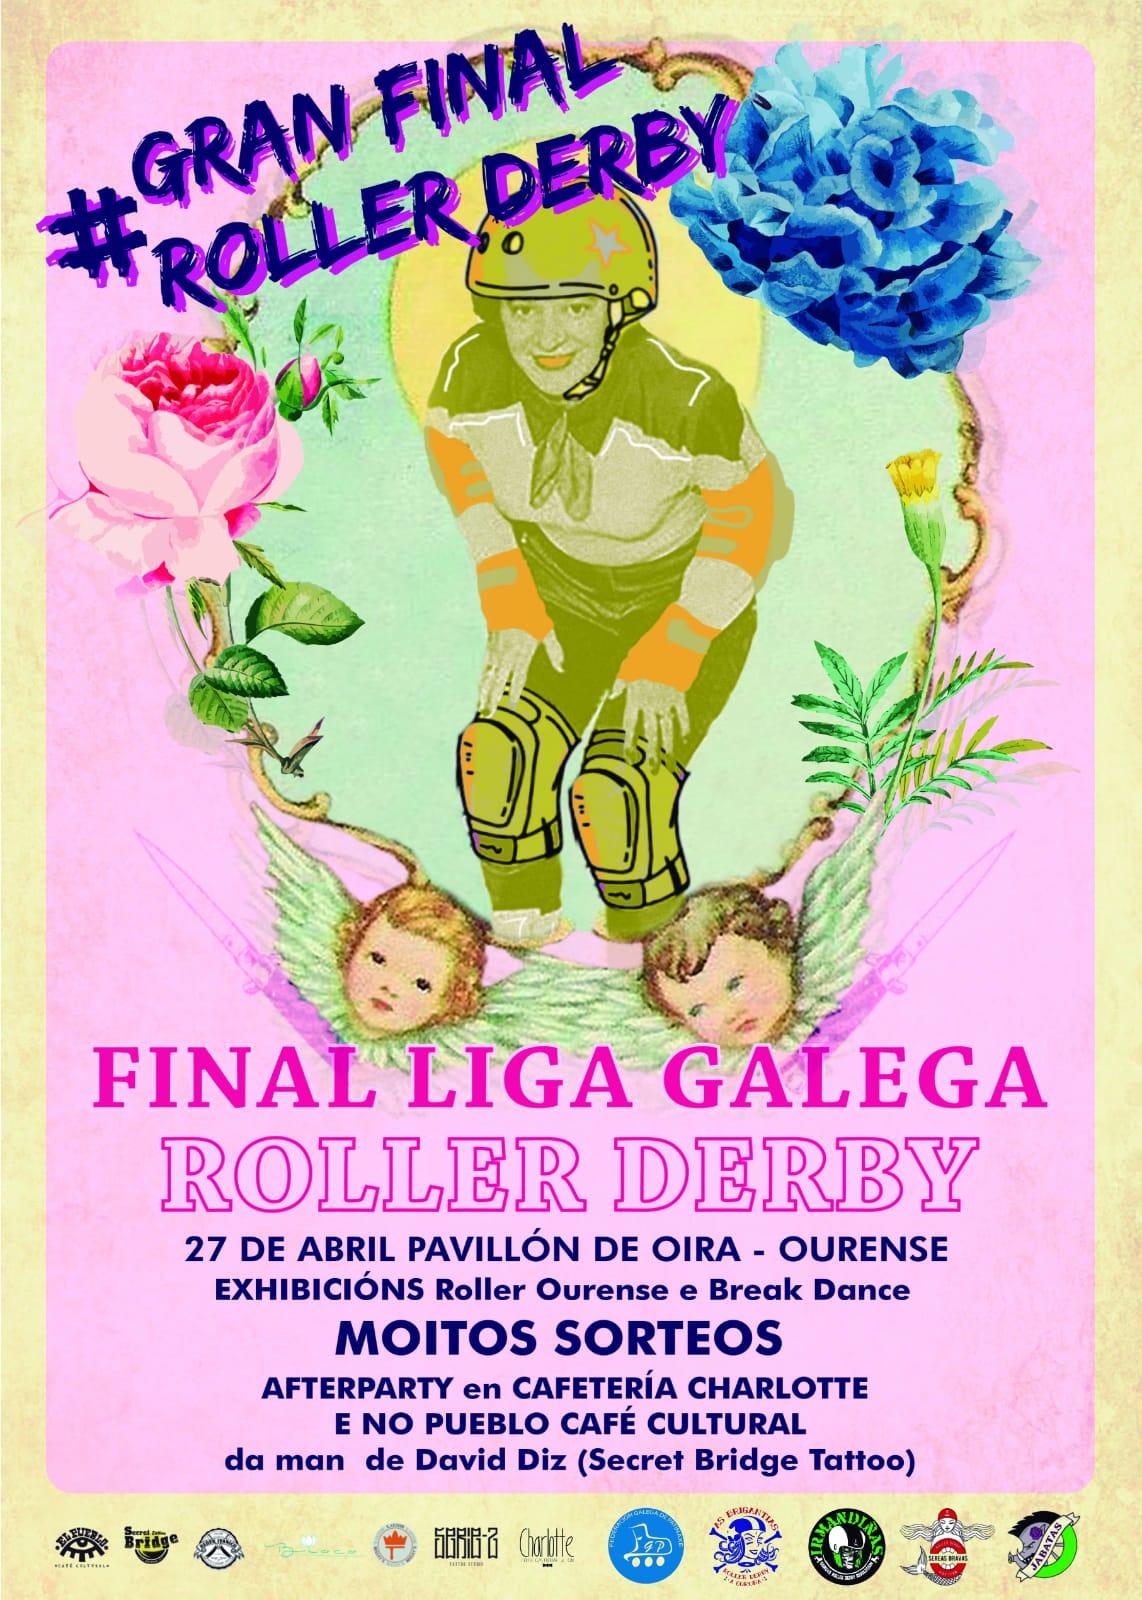 2019-04-27-RD-Cartel-LigaGalega-FaseFinal